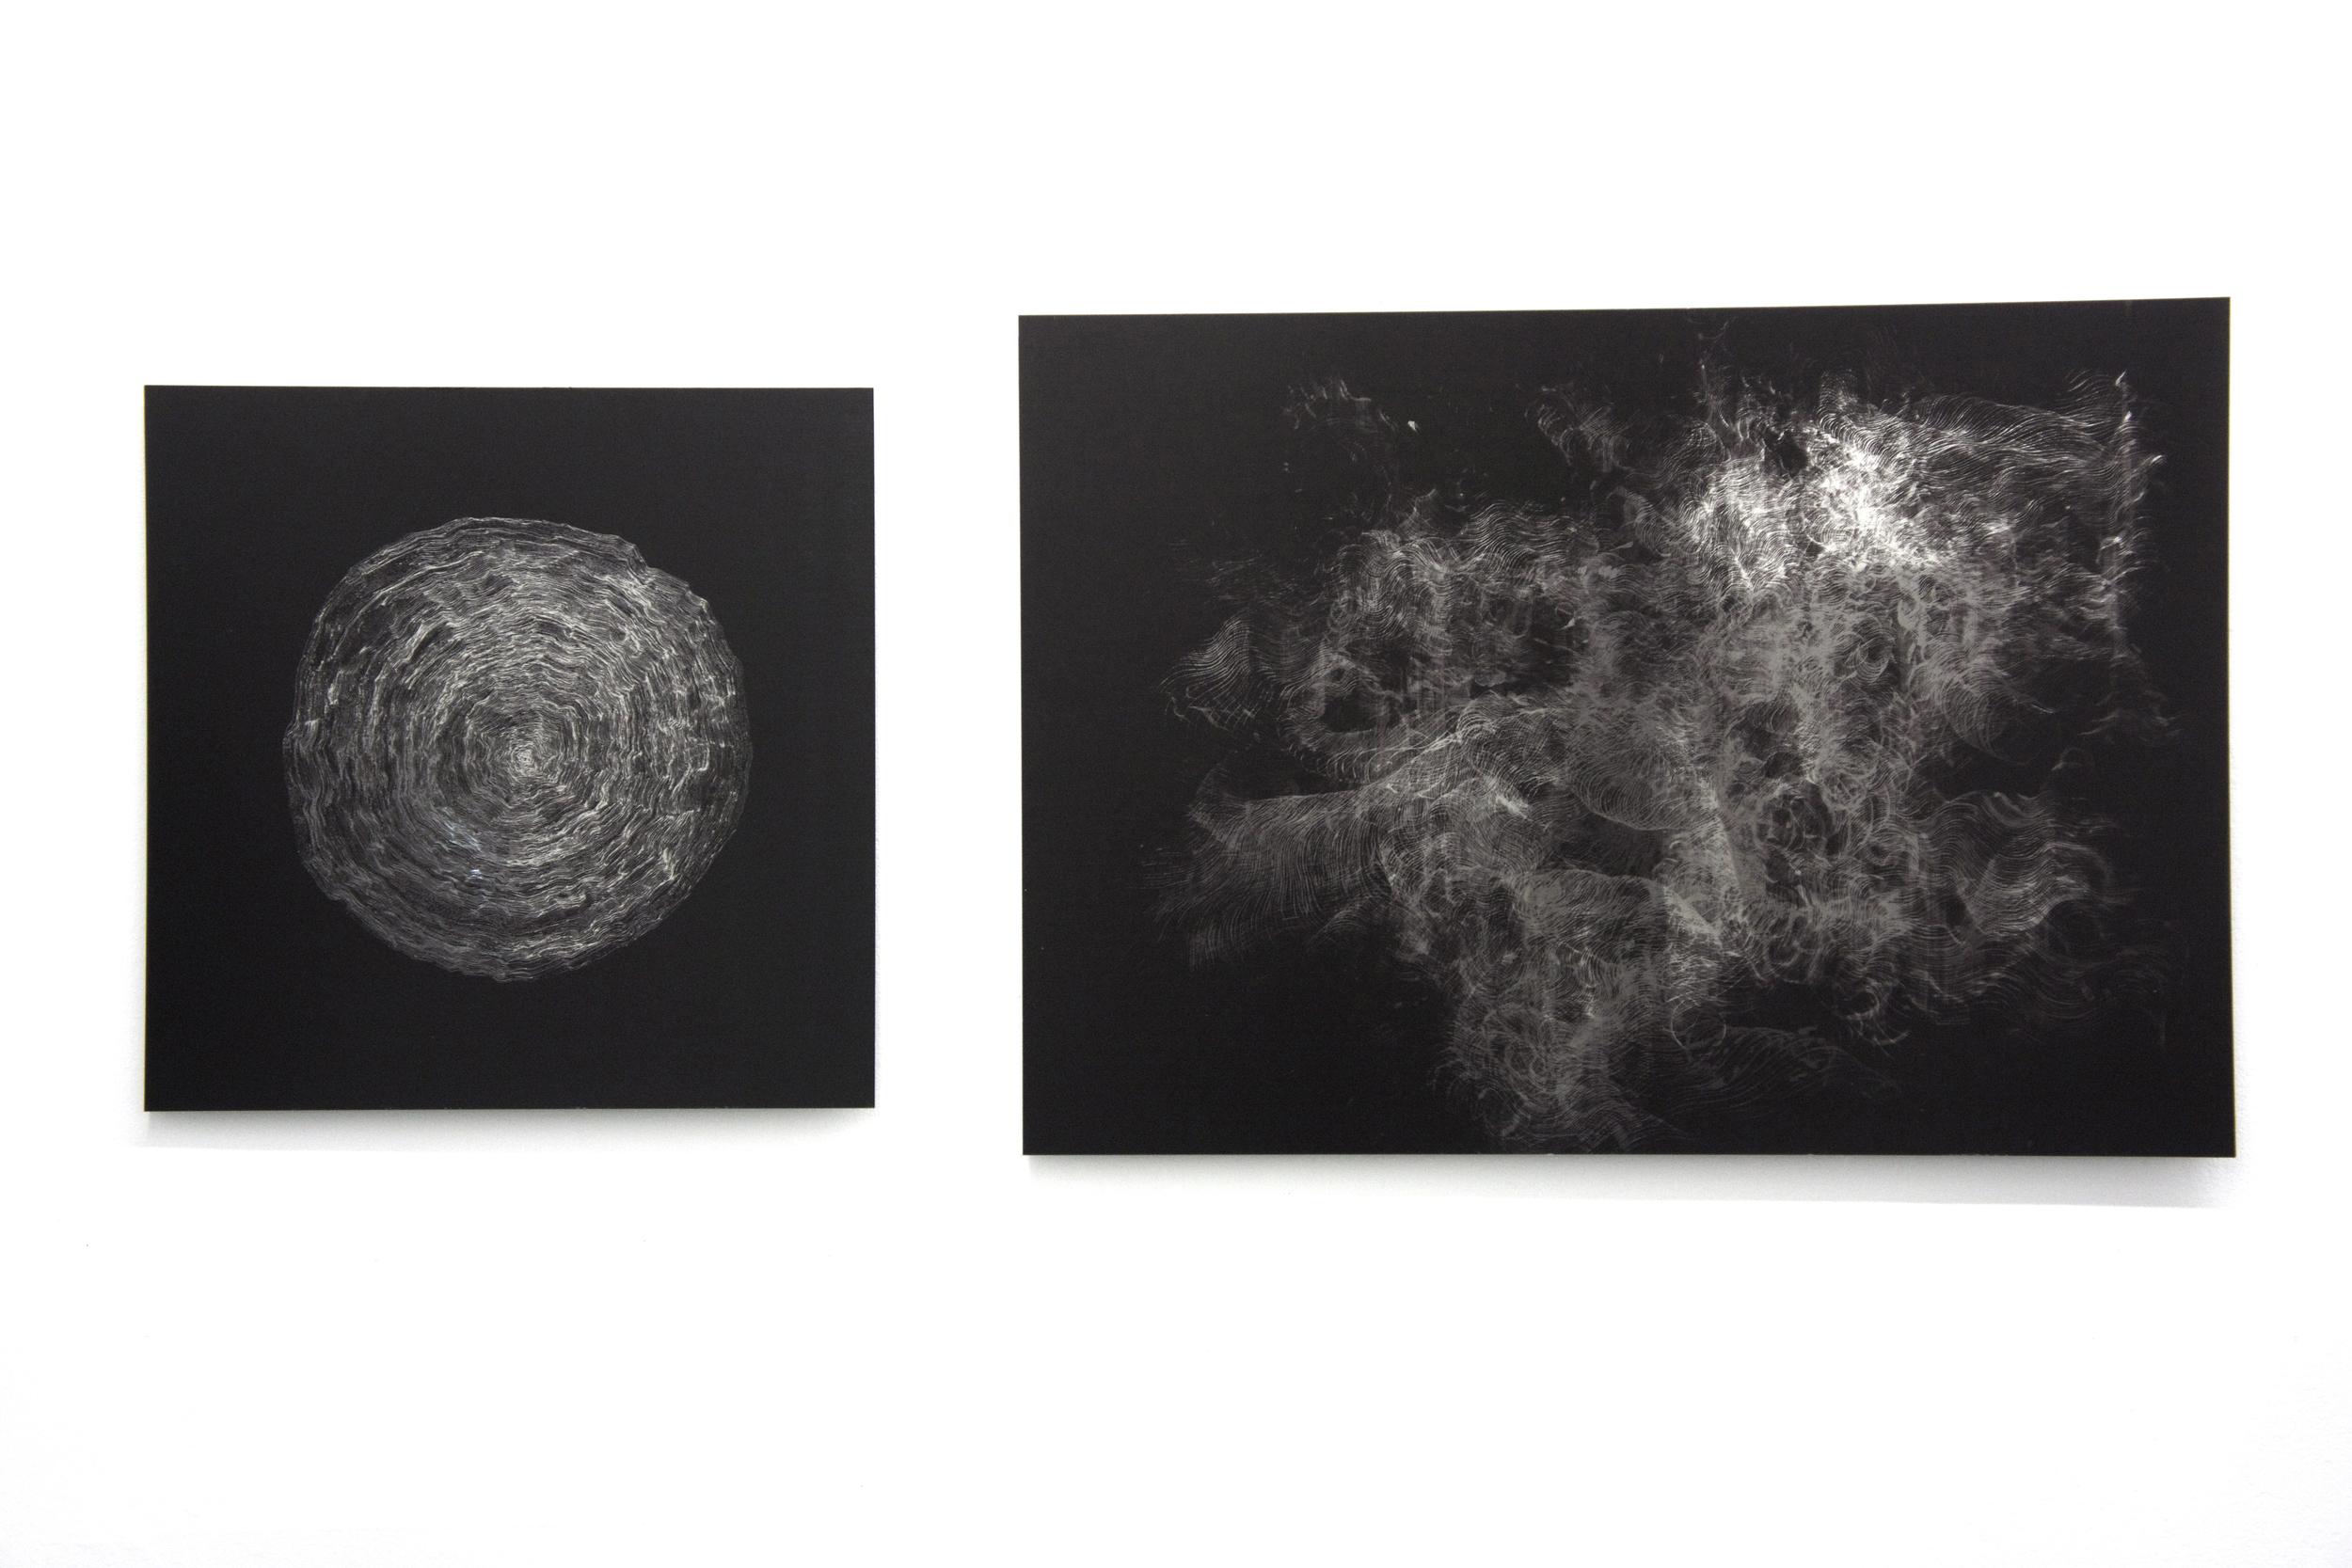 'Inversion', Digital Print on Mirror